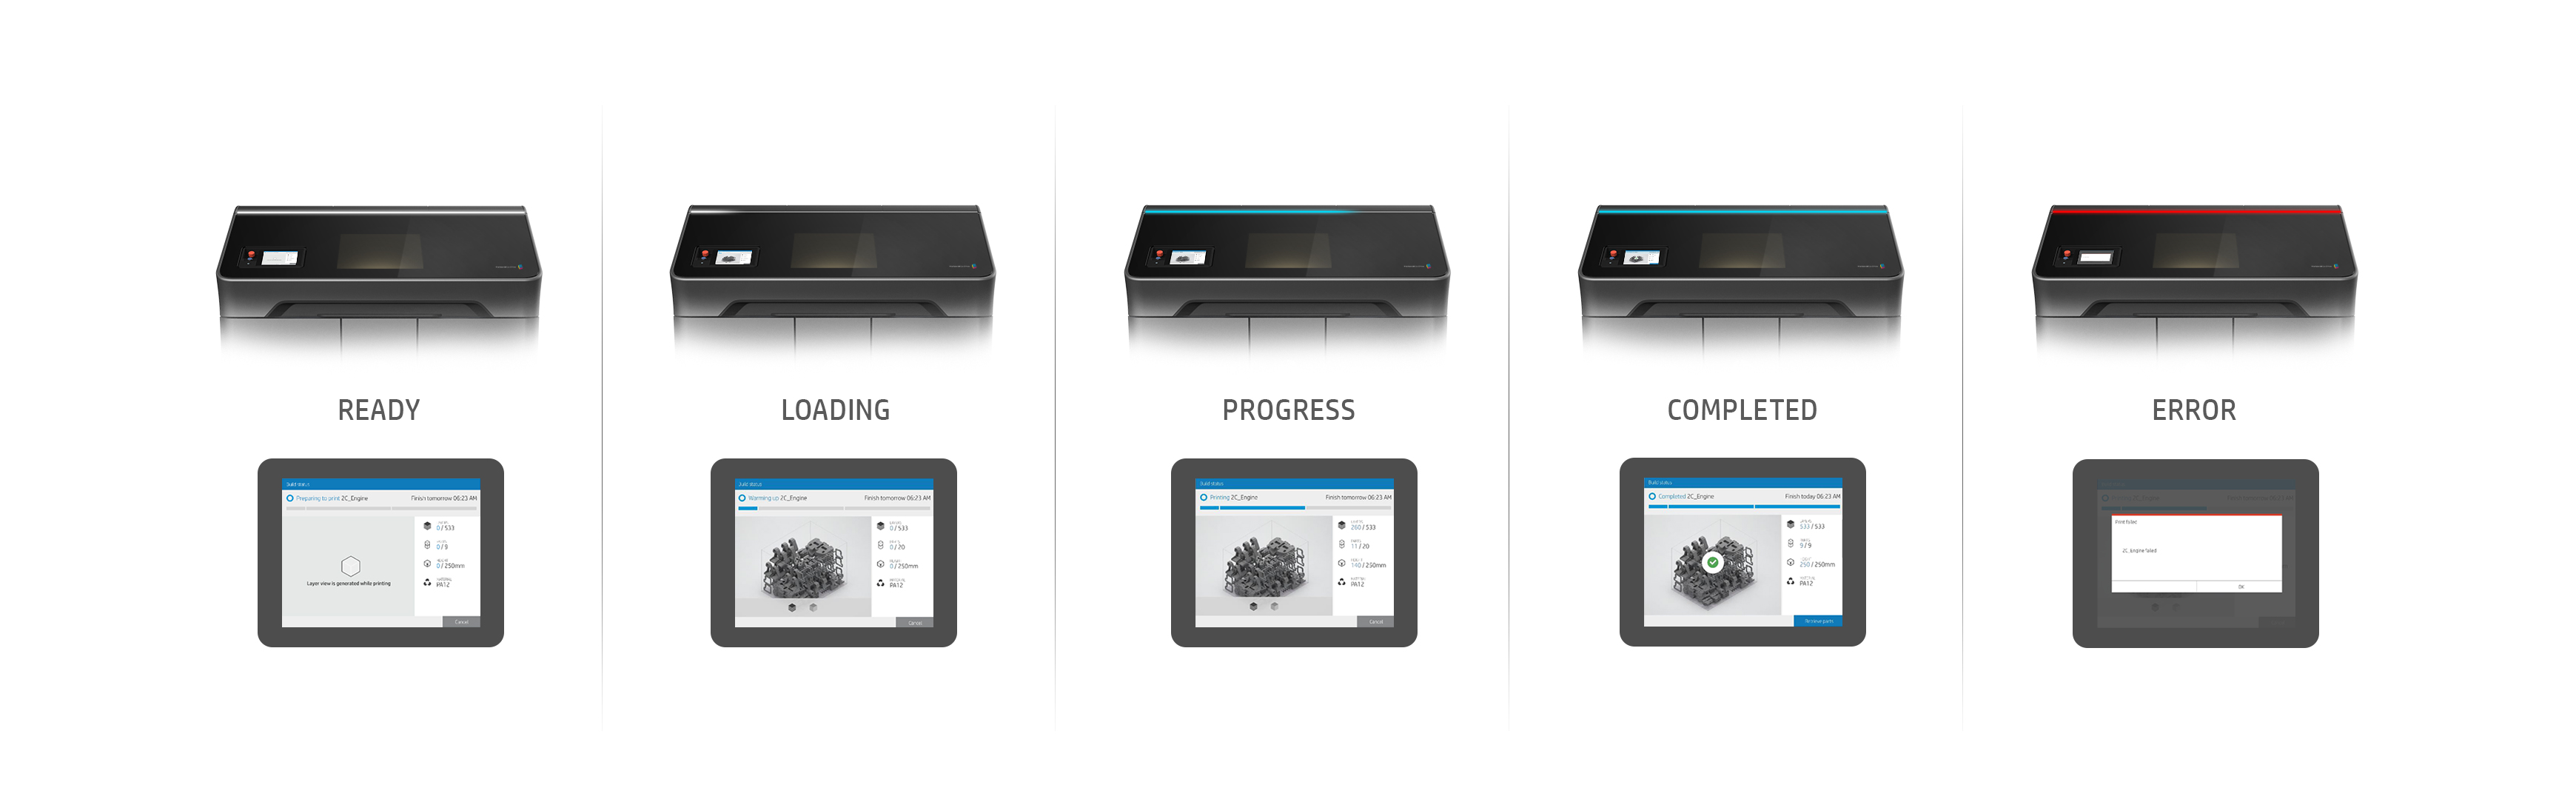 UX Design for HP Jet Fusion 3D Printers